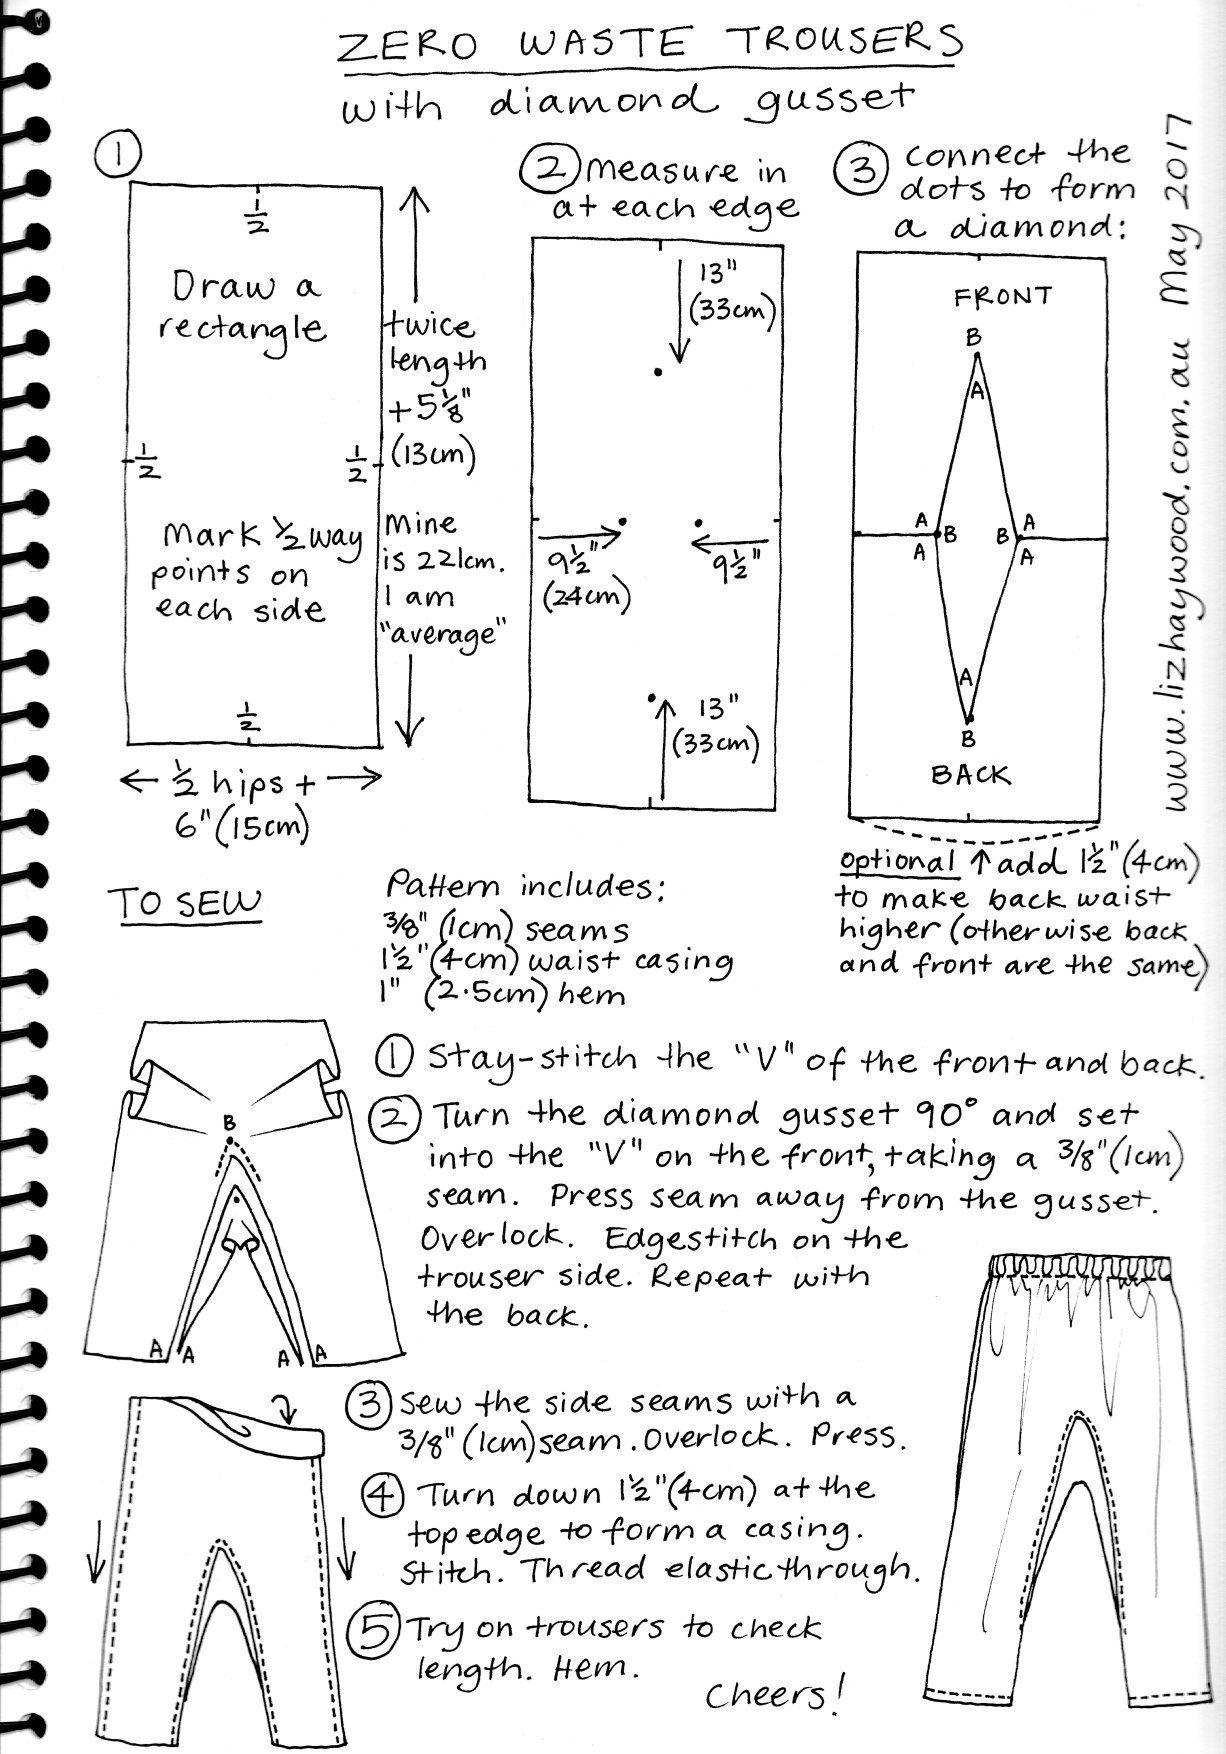 Zero waste trousers with gusset pattern | Useful Stuff | Pinterest ...